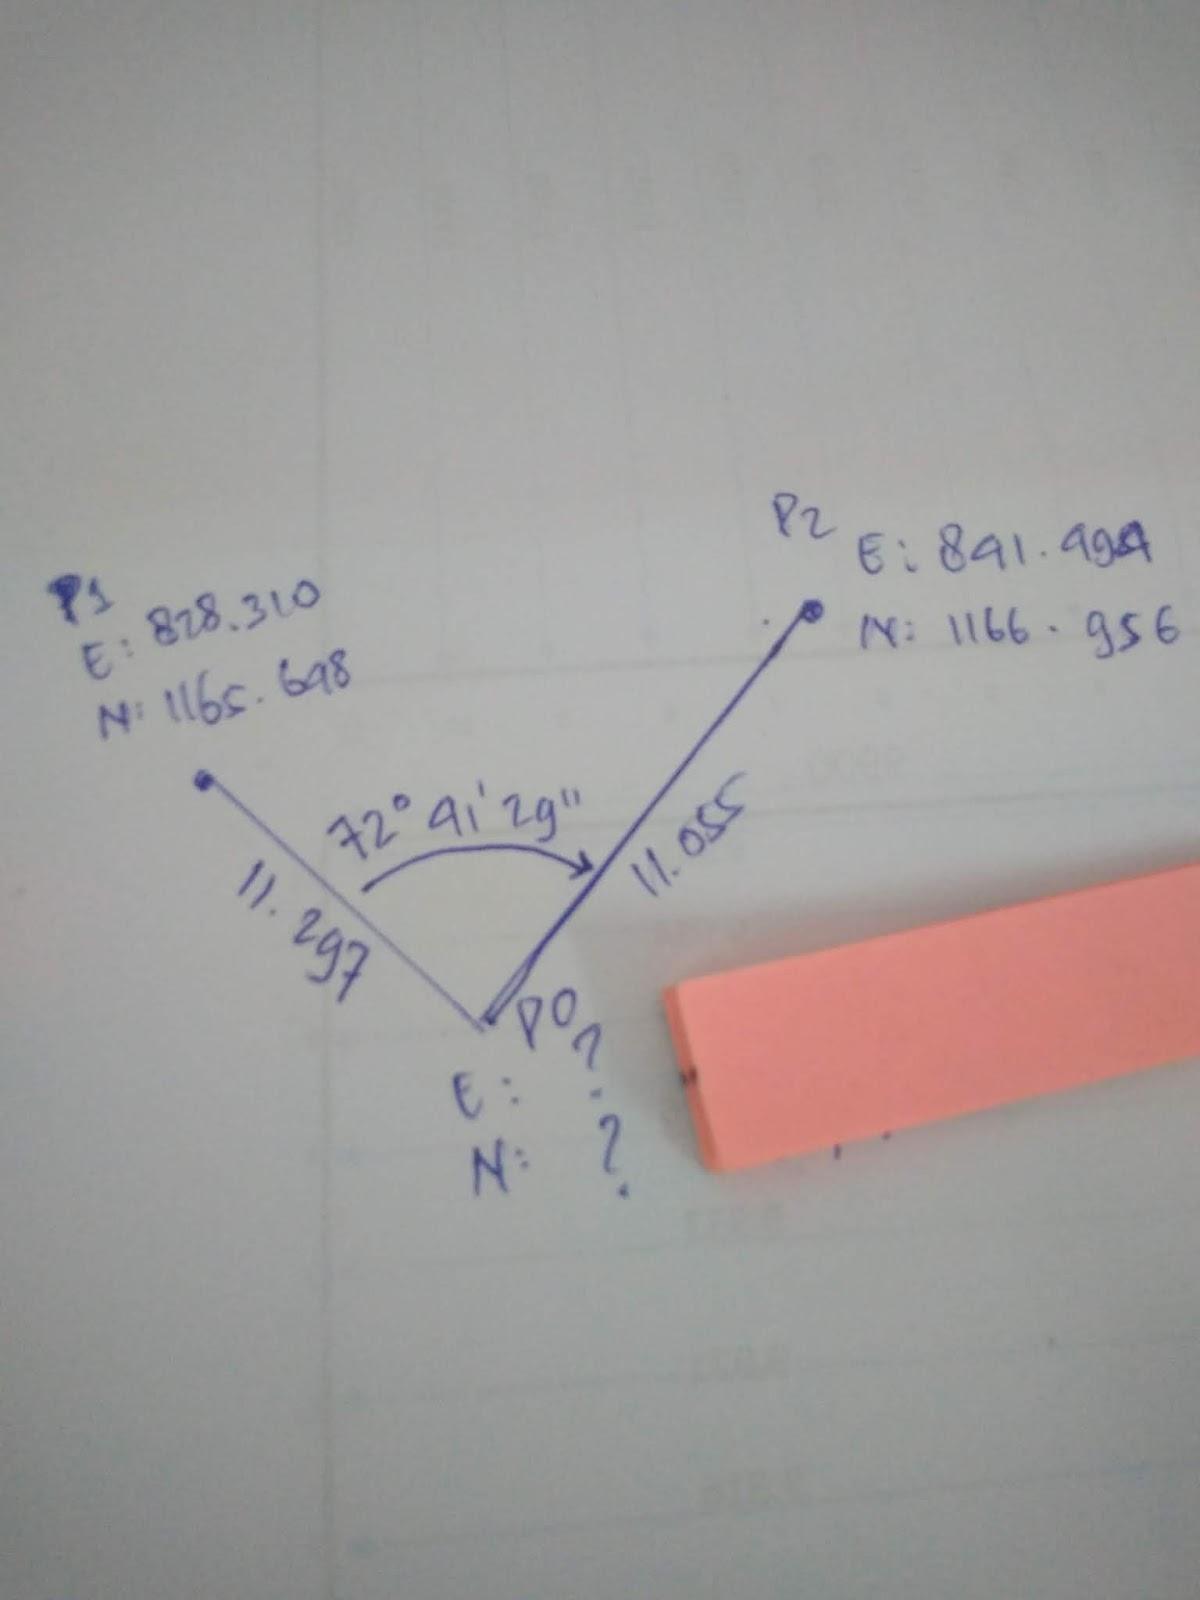 Cara Mengetahui Nilai Koordinat dengan Resection dengan 2 ...